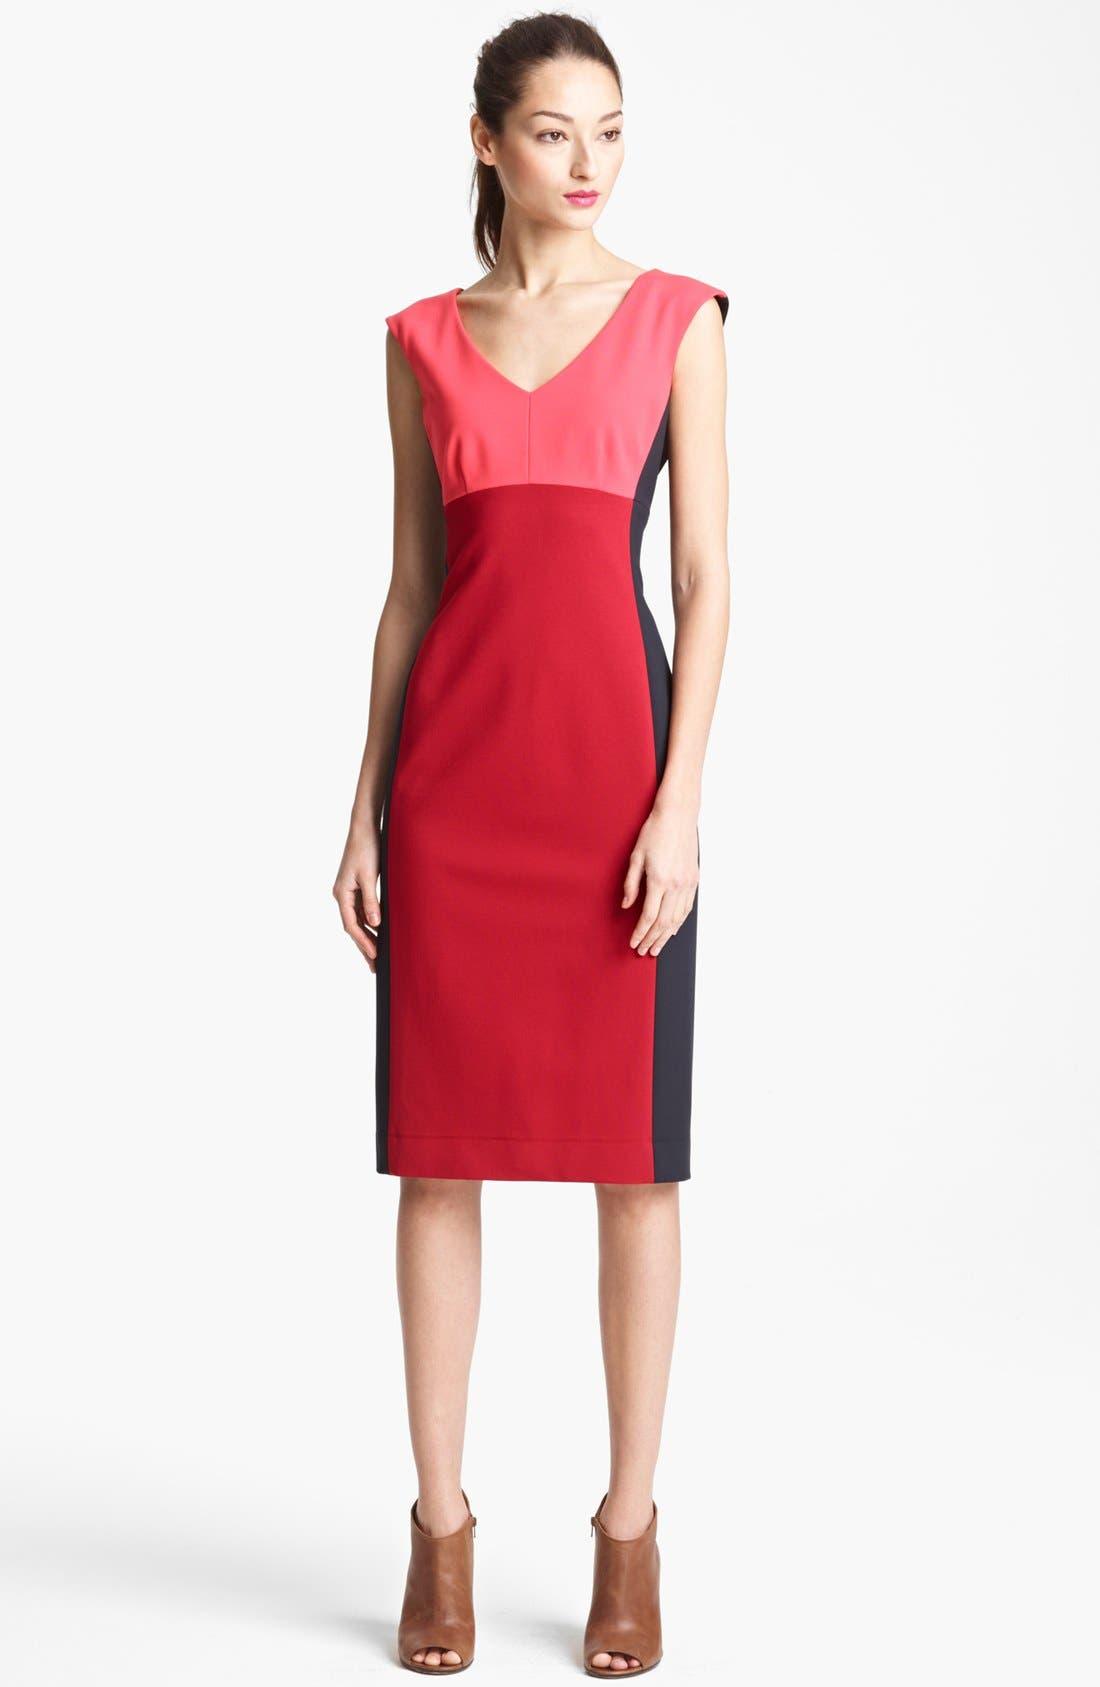 Alternate Image 1 Selected - Lida Baday Sleeveless Colorblock Dress